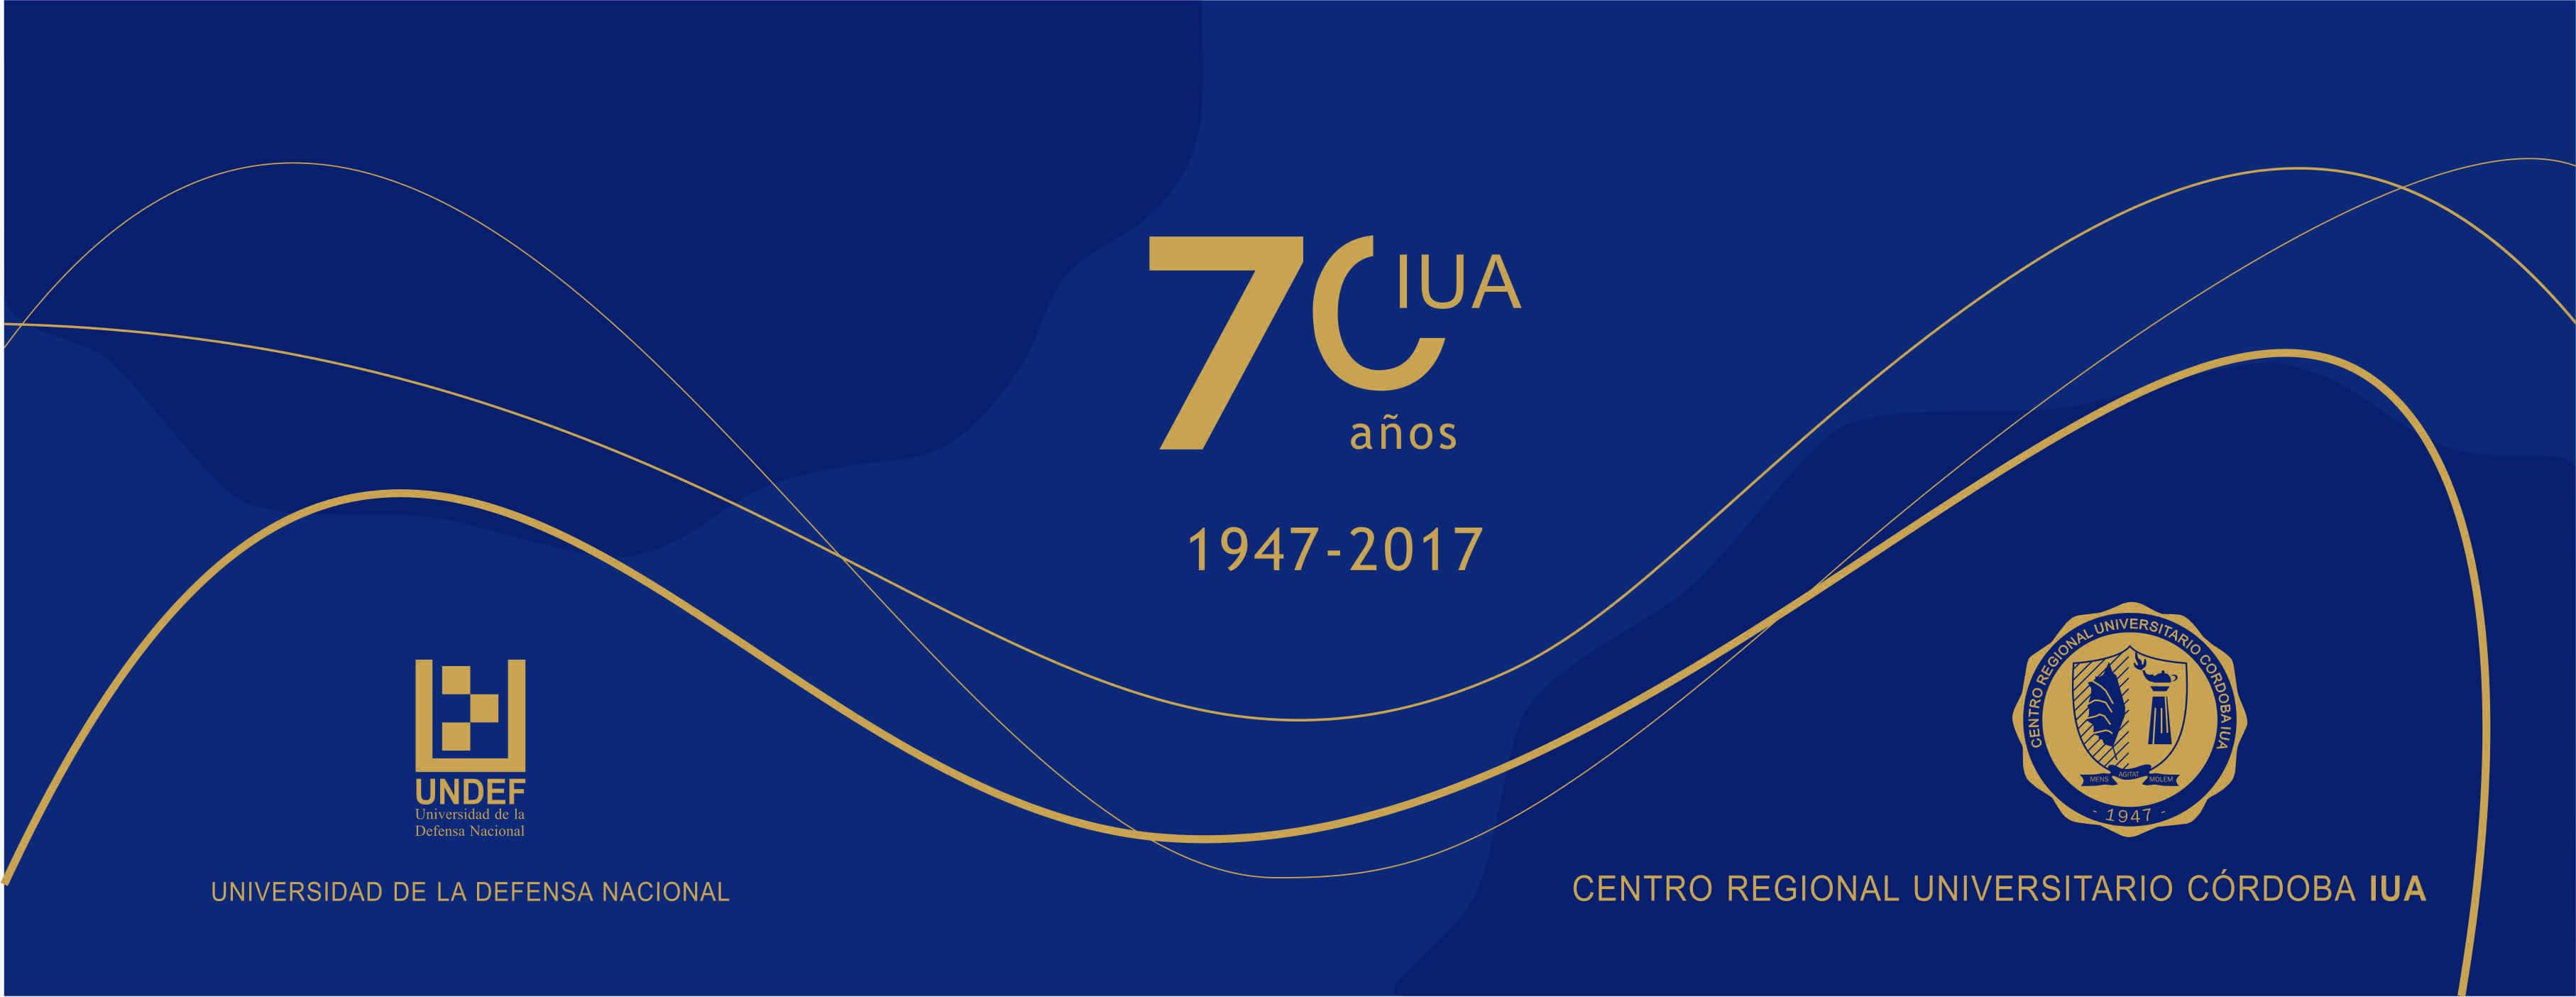 70º Aniversario IUA - 1947 / 2017